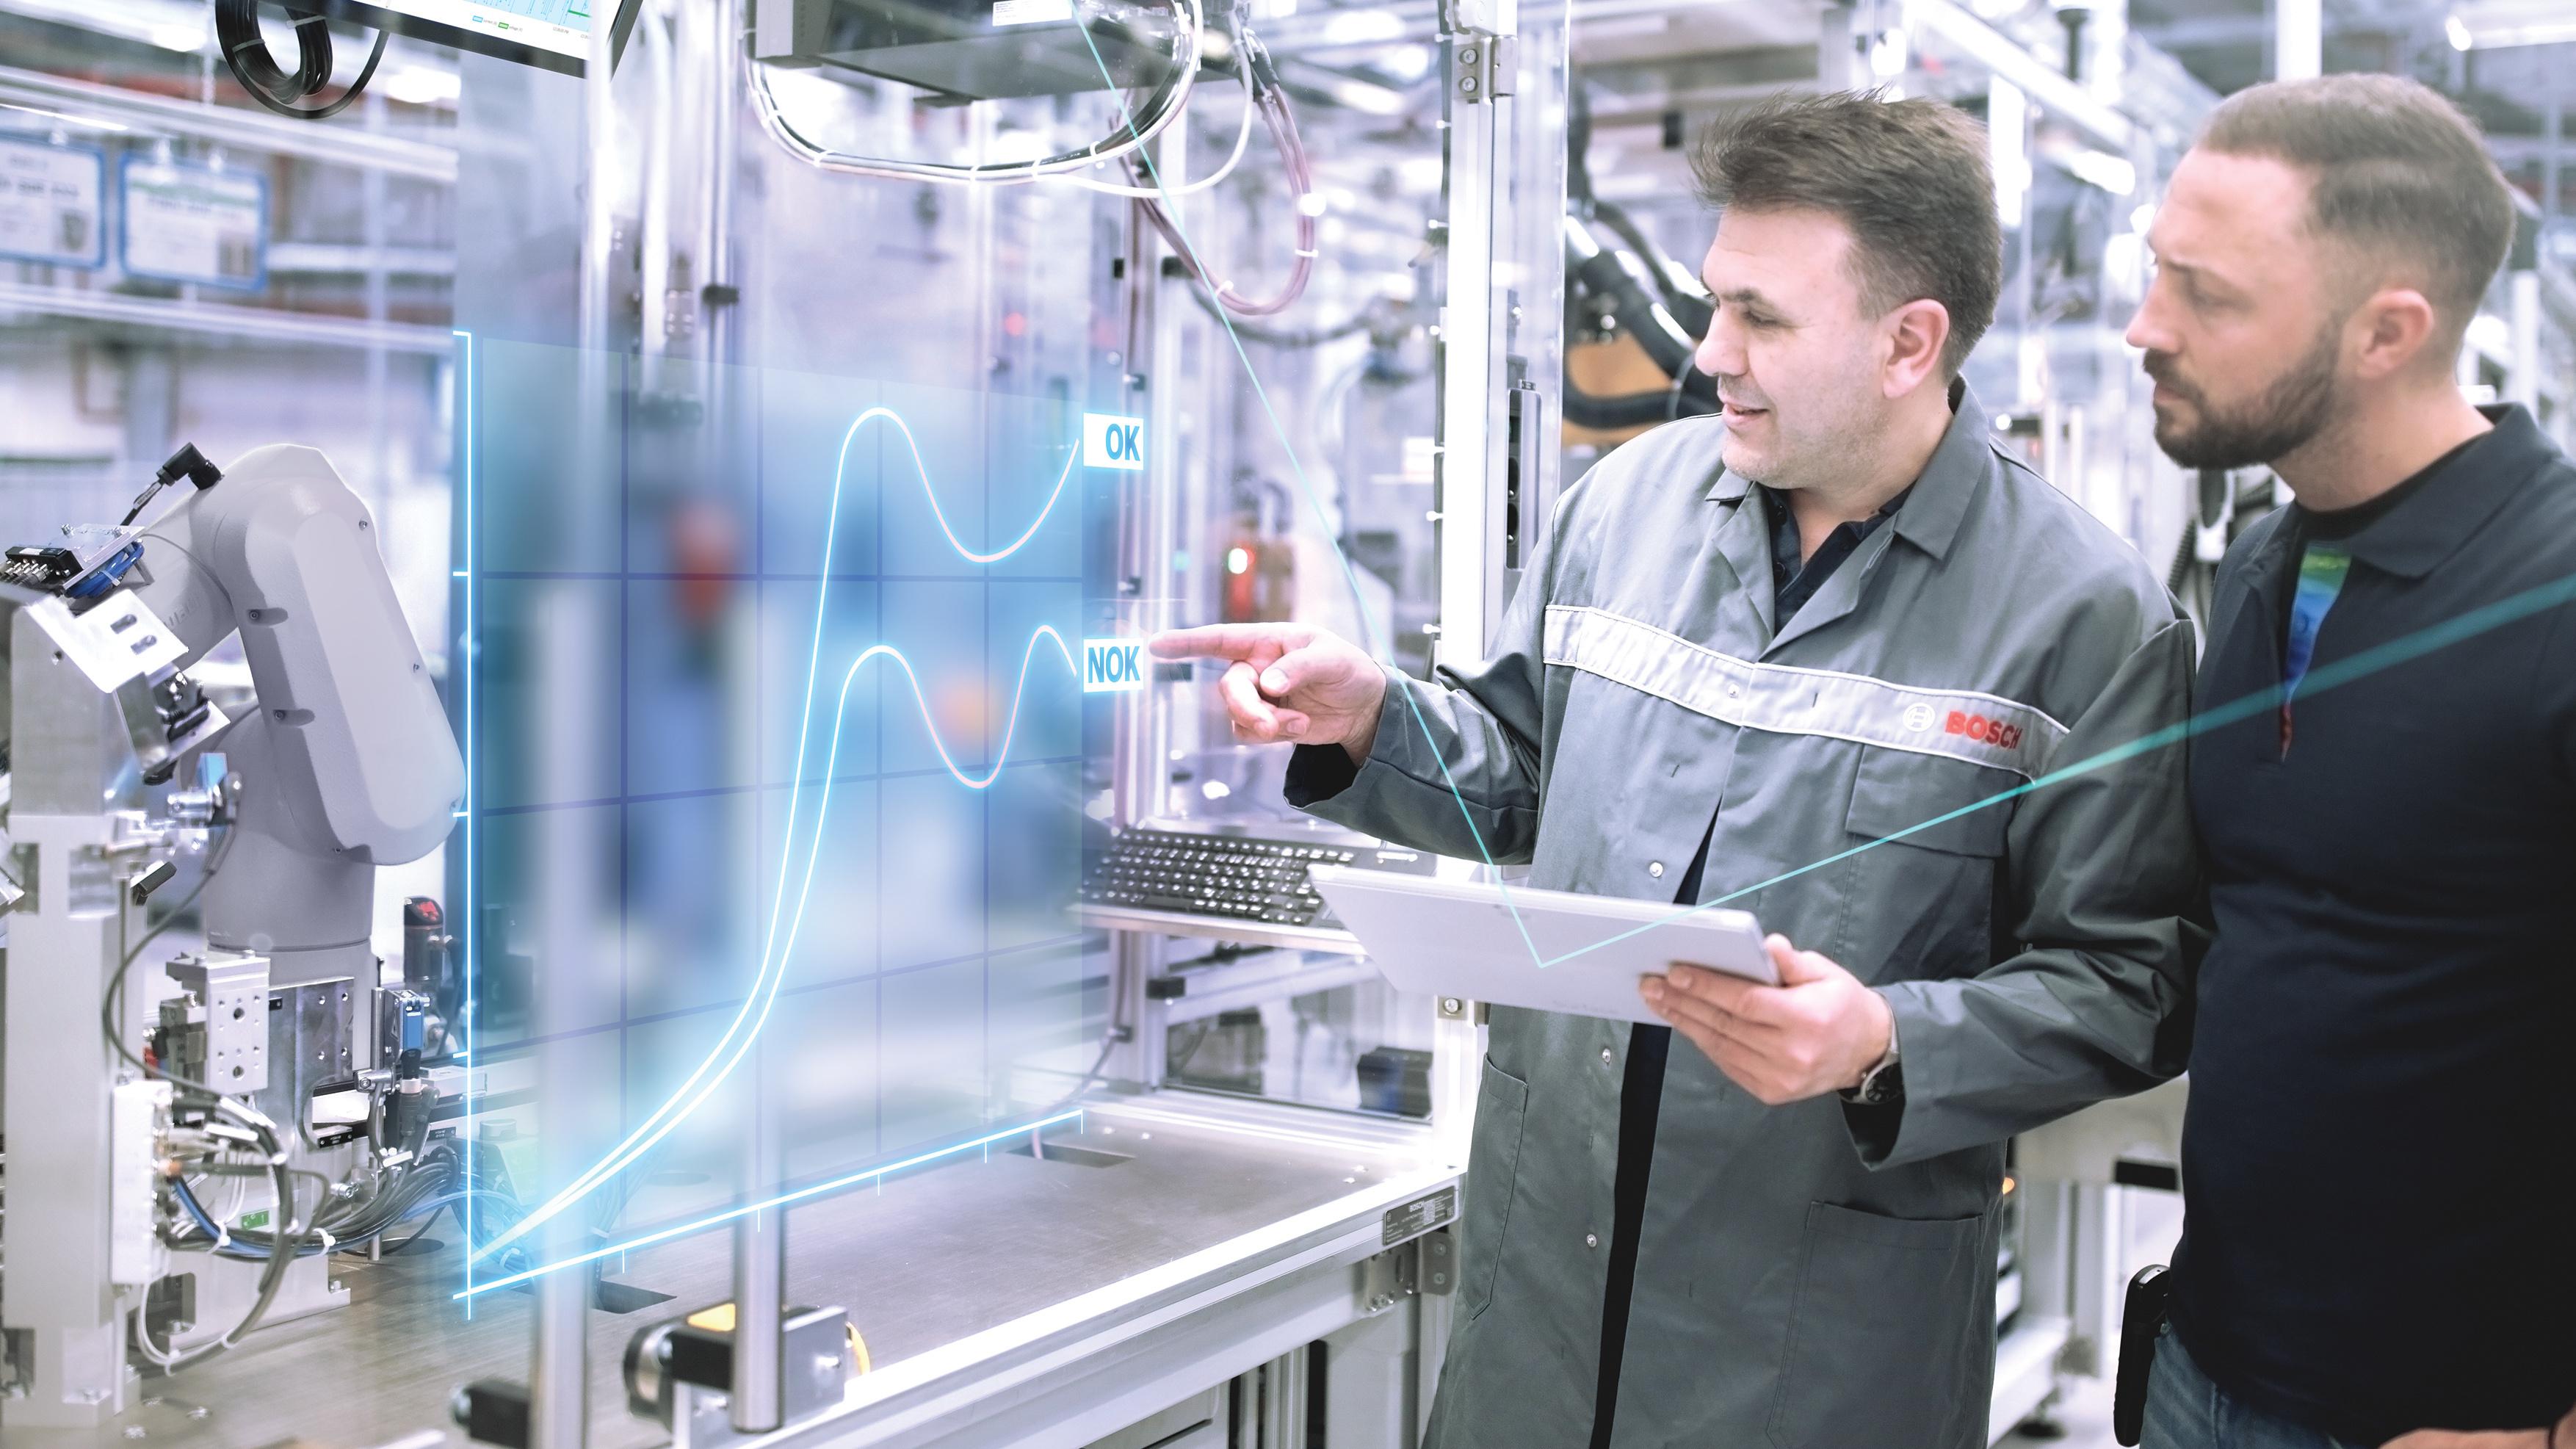 Focus on Industry 4.0